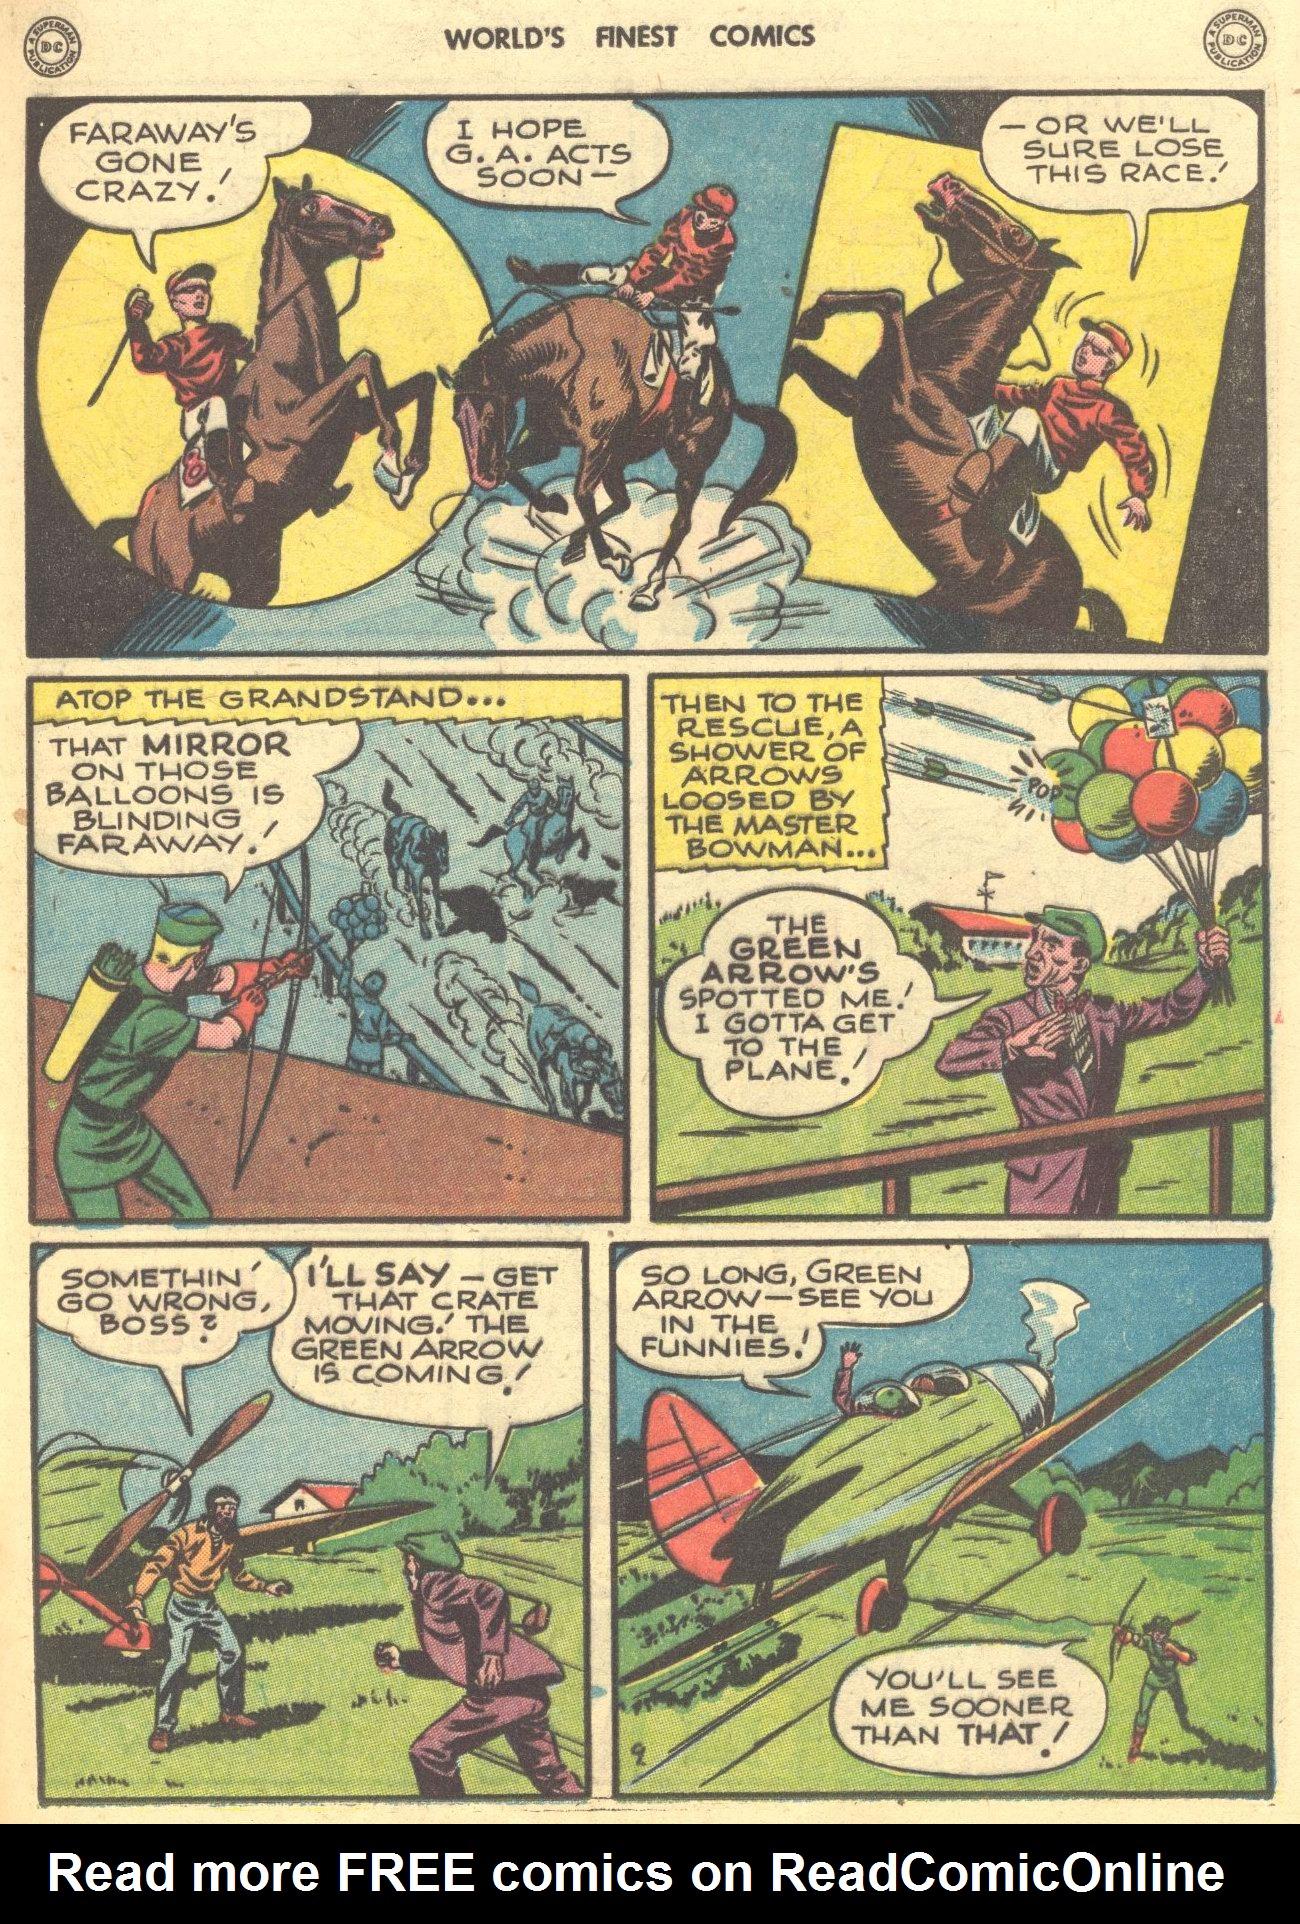 Read online World's Finest Comics comic -  Issue #28 - 24